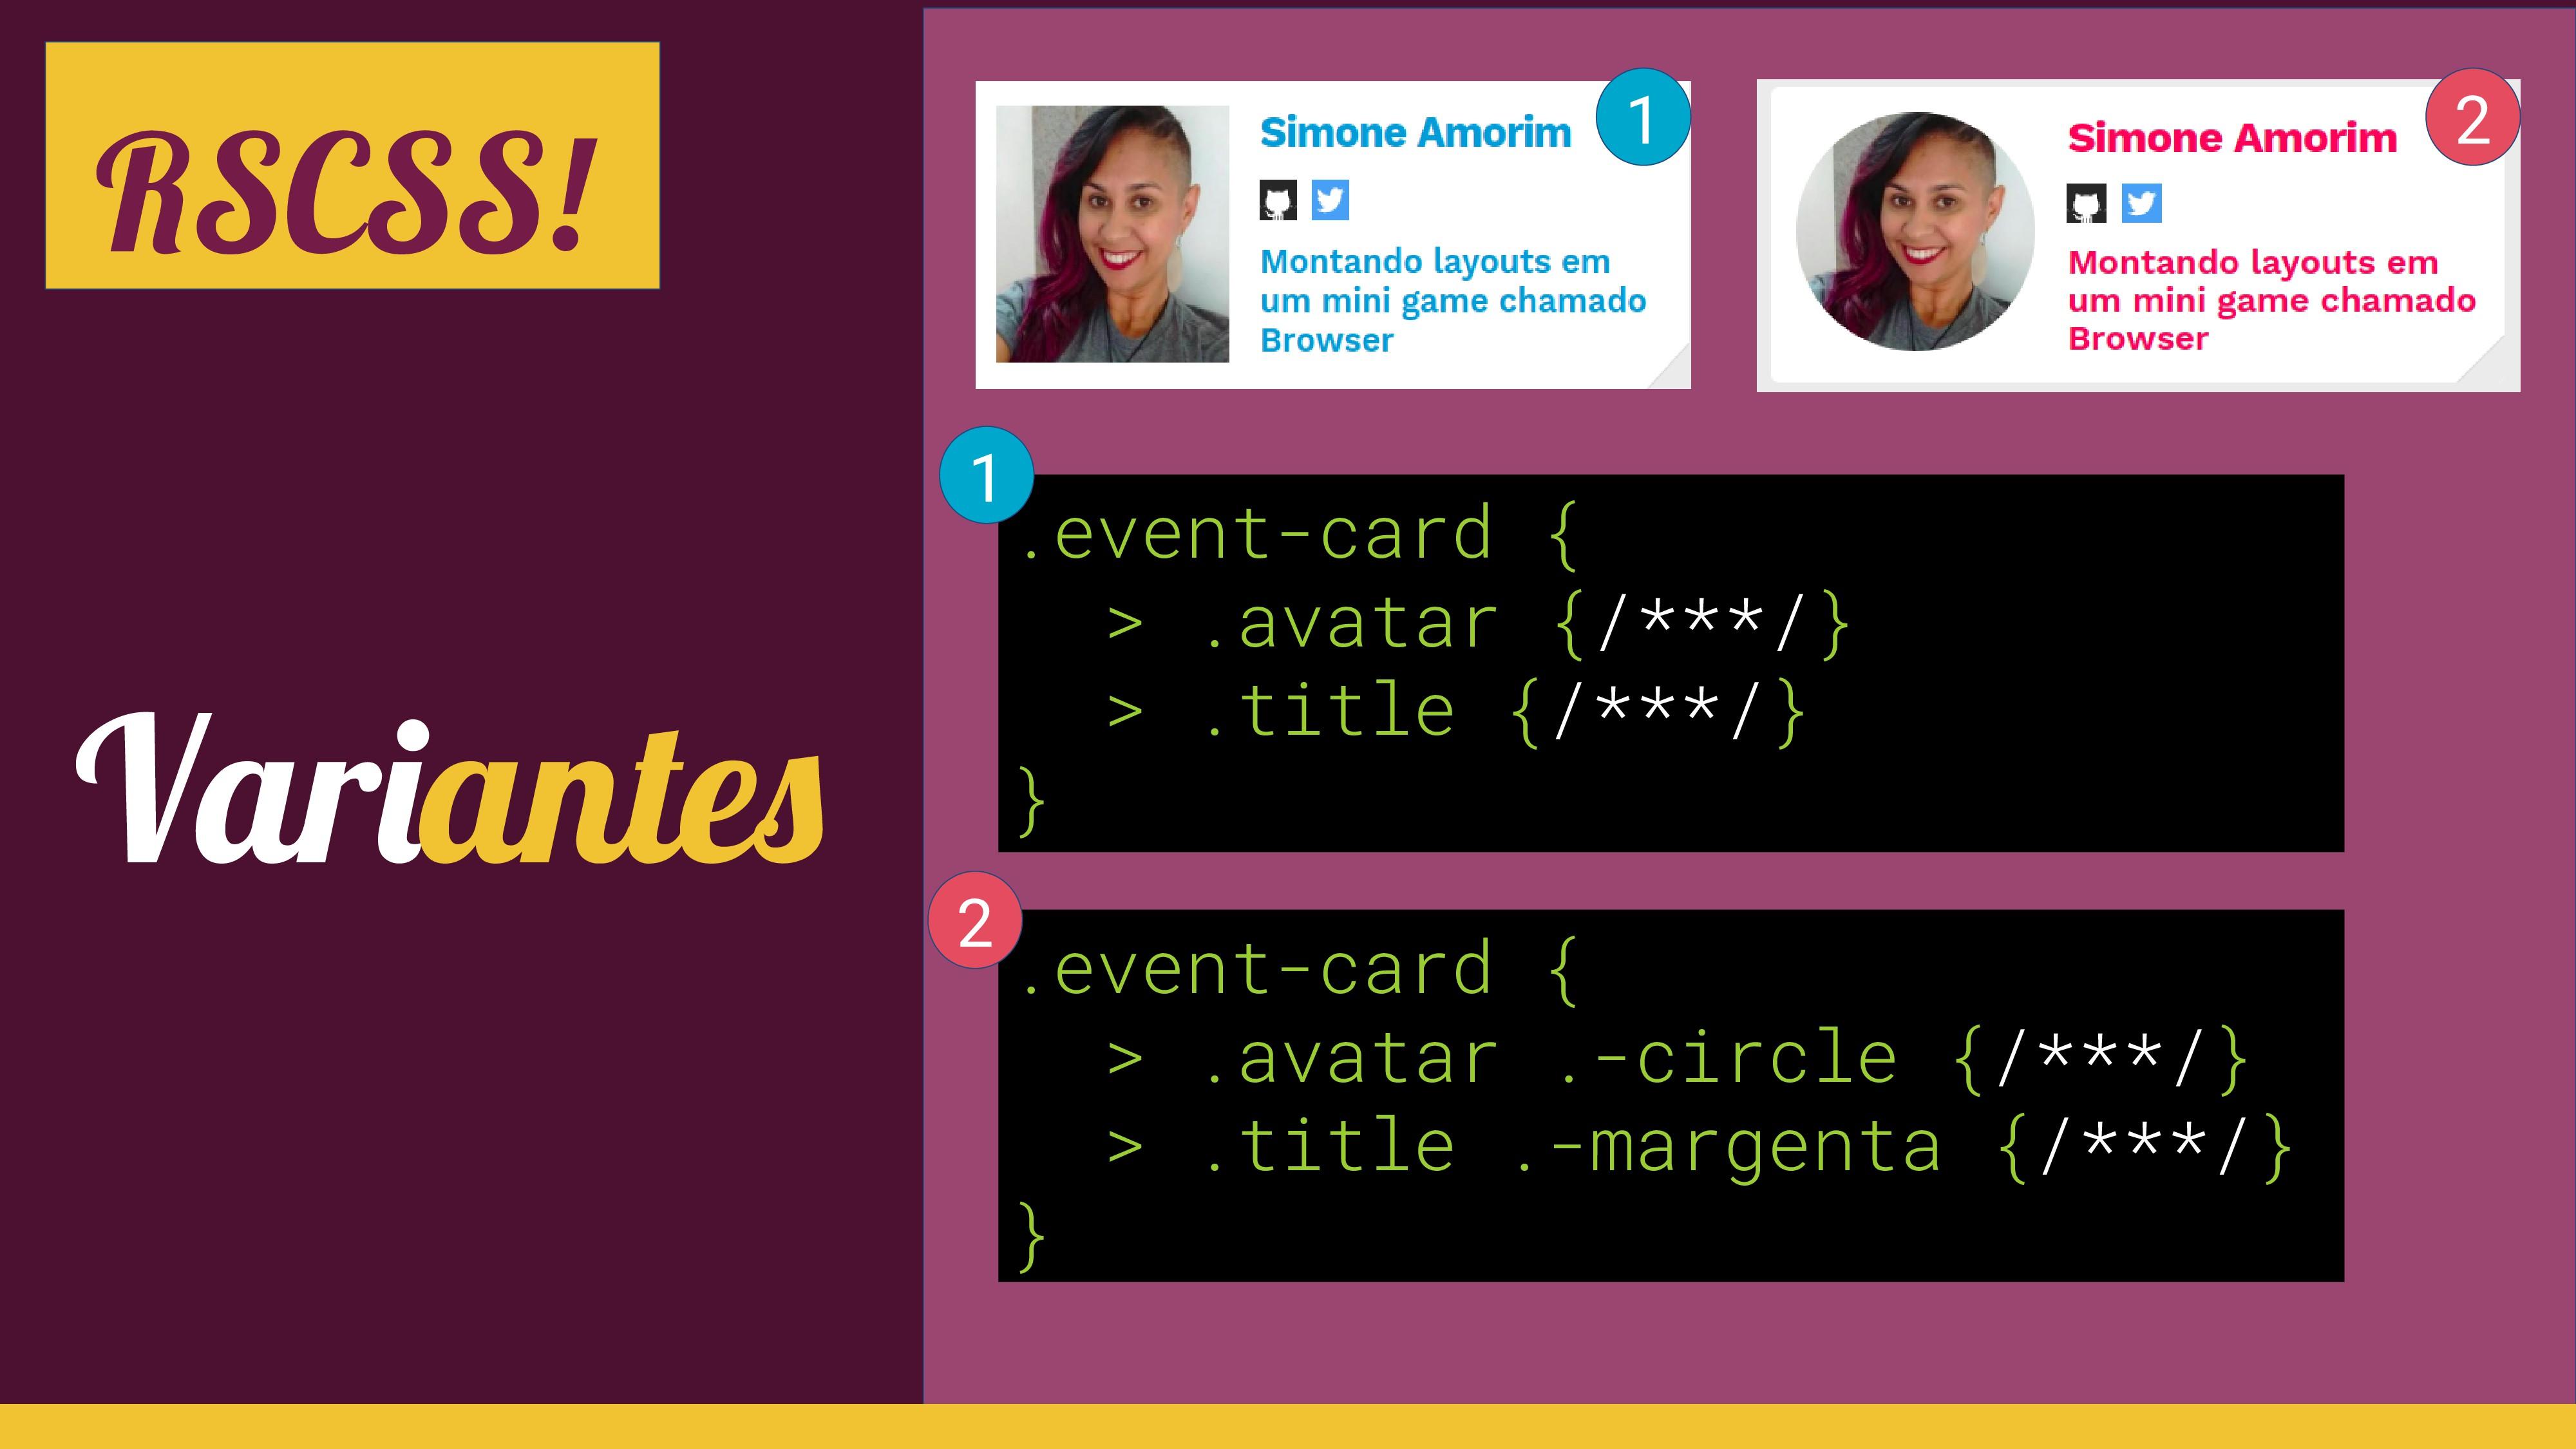 Variantes RSCSS! .event-card { > .avatar .-circ...